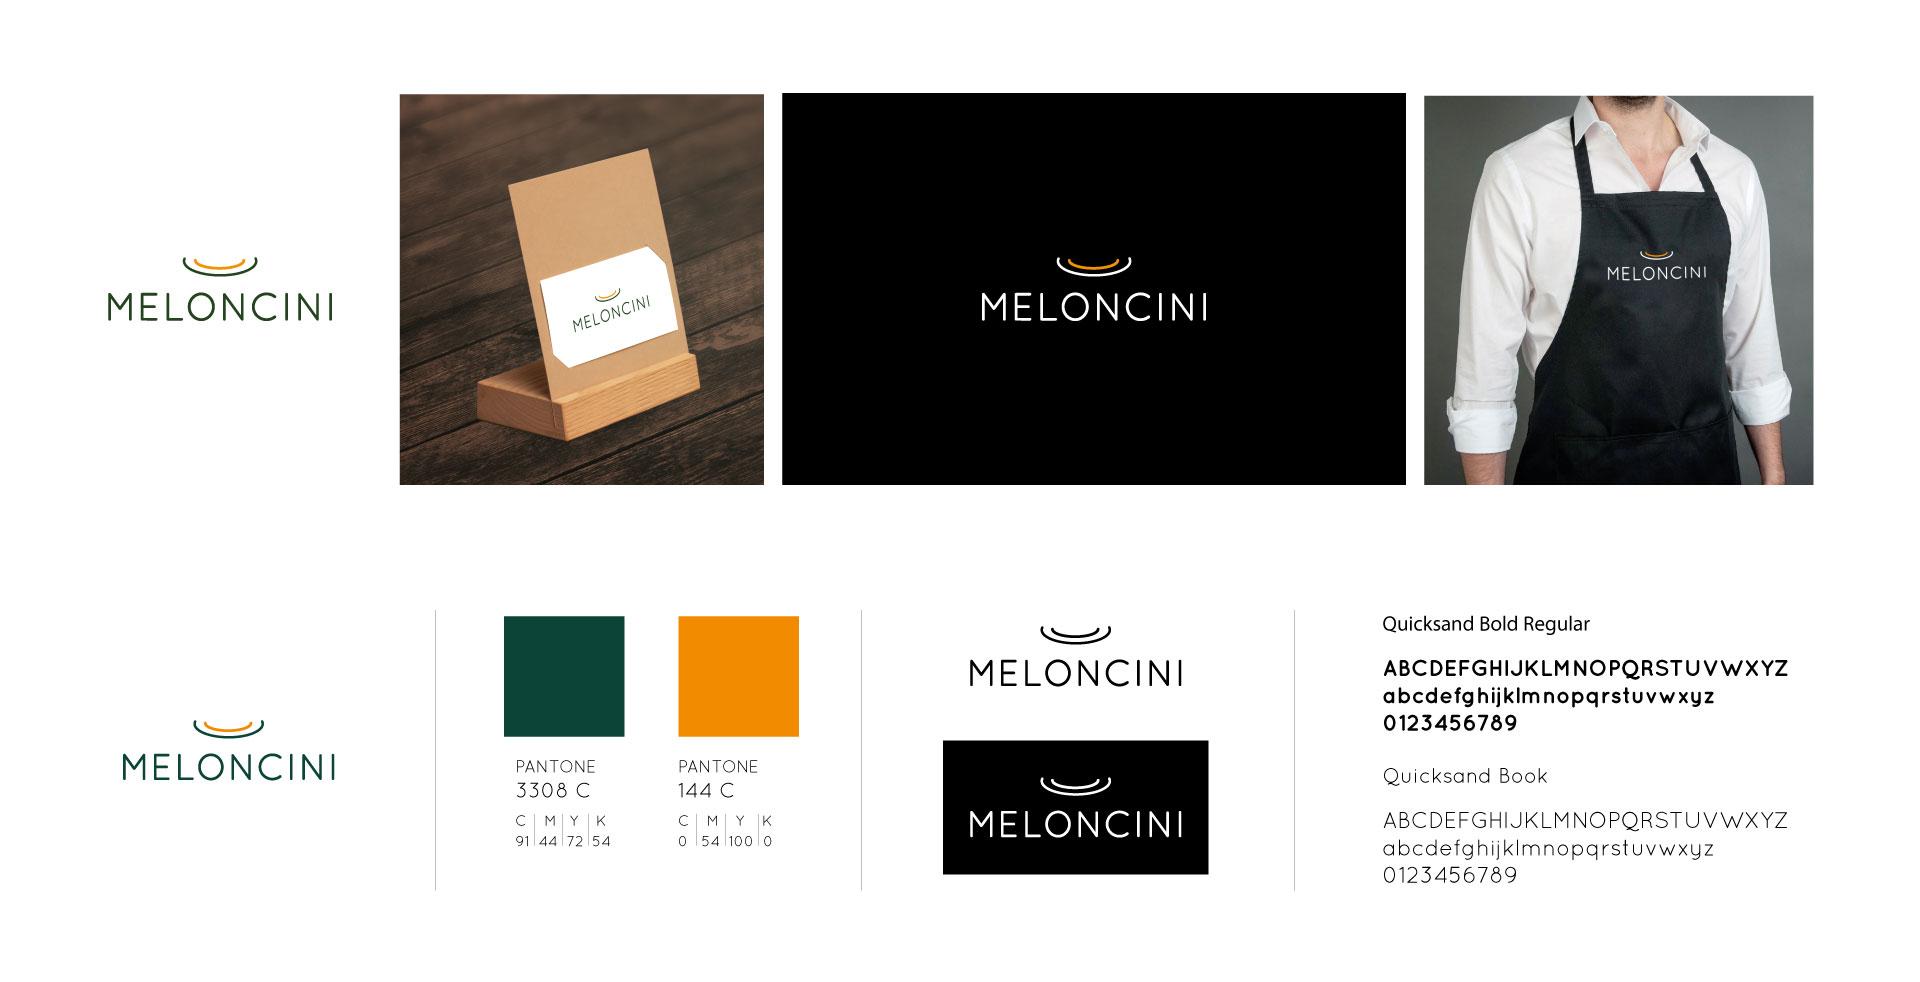 MELONCINI_logo